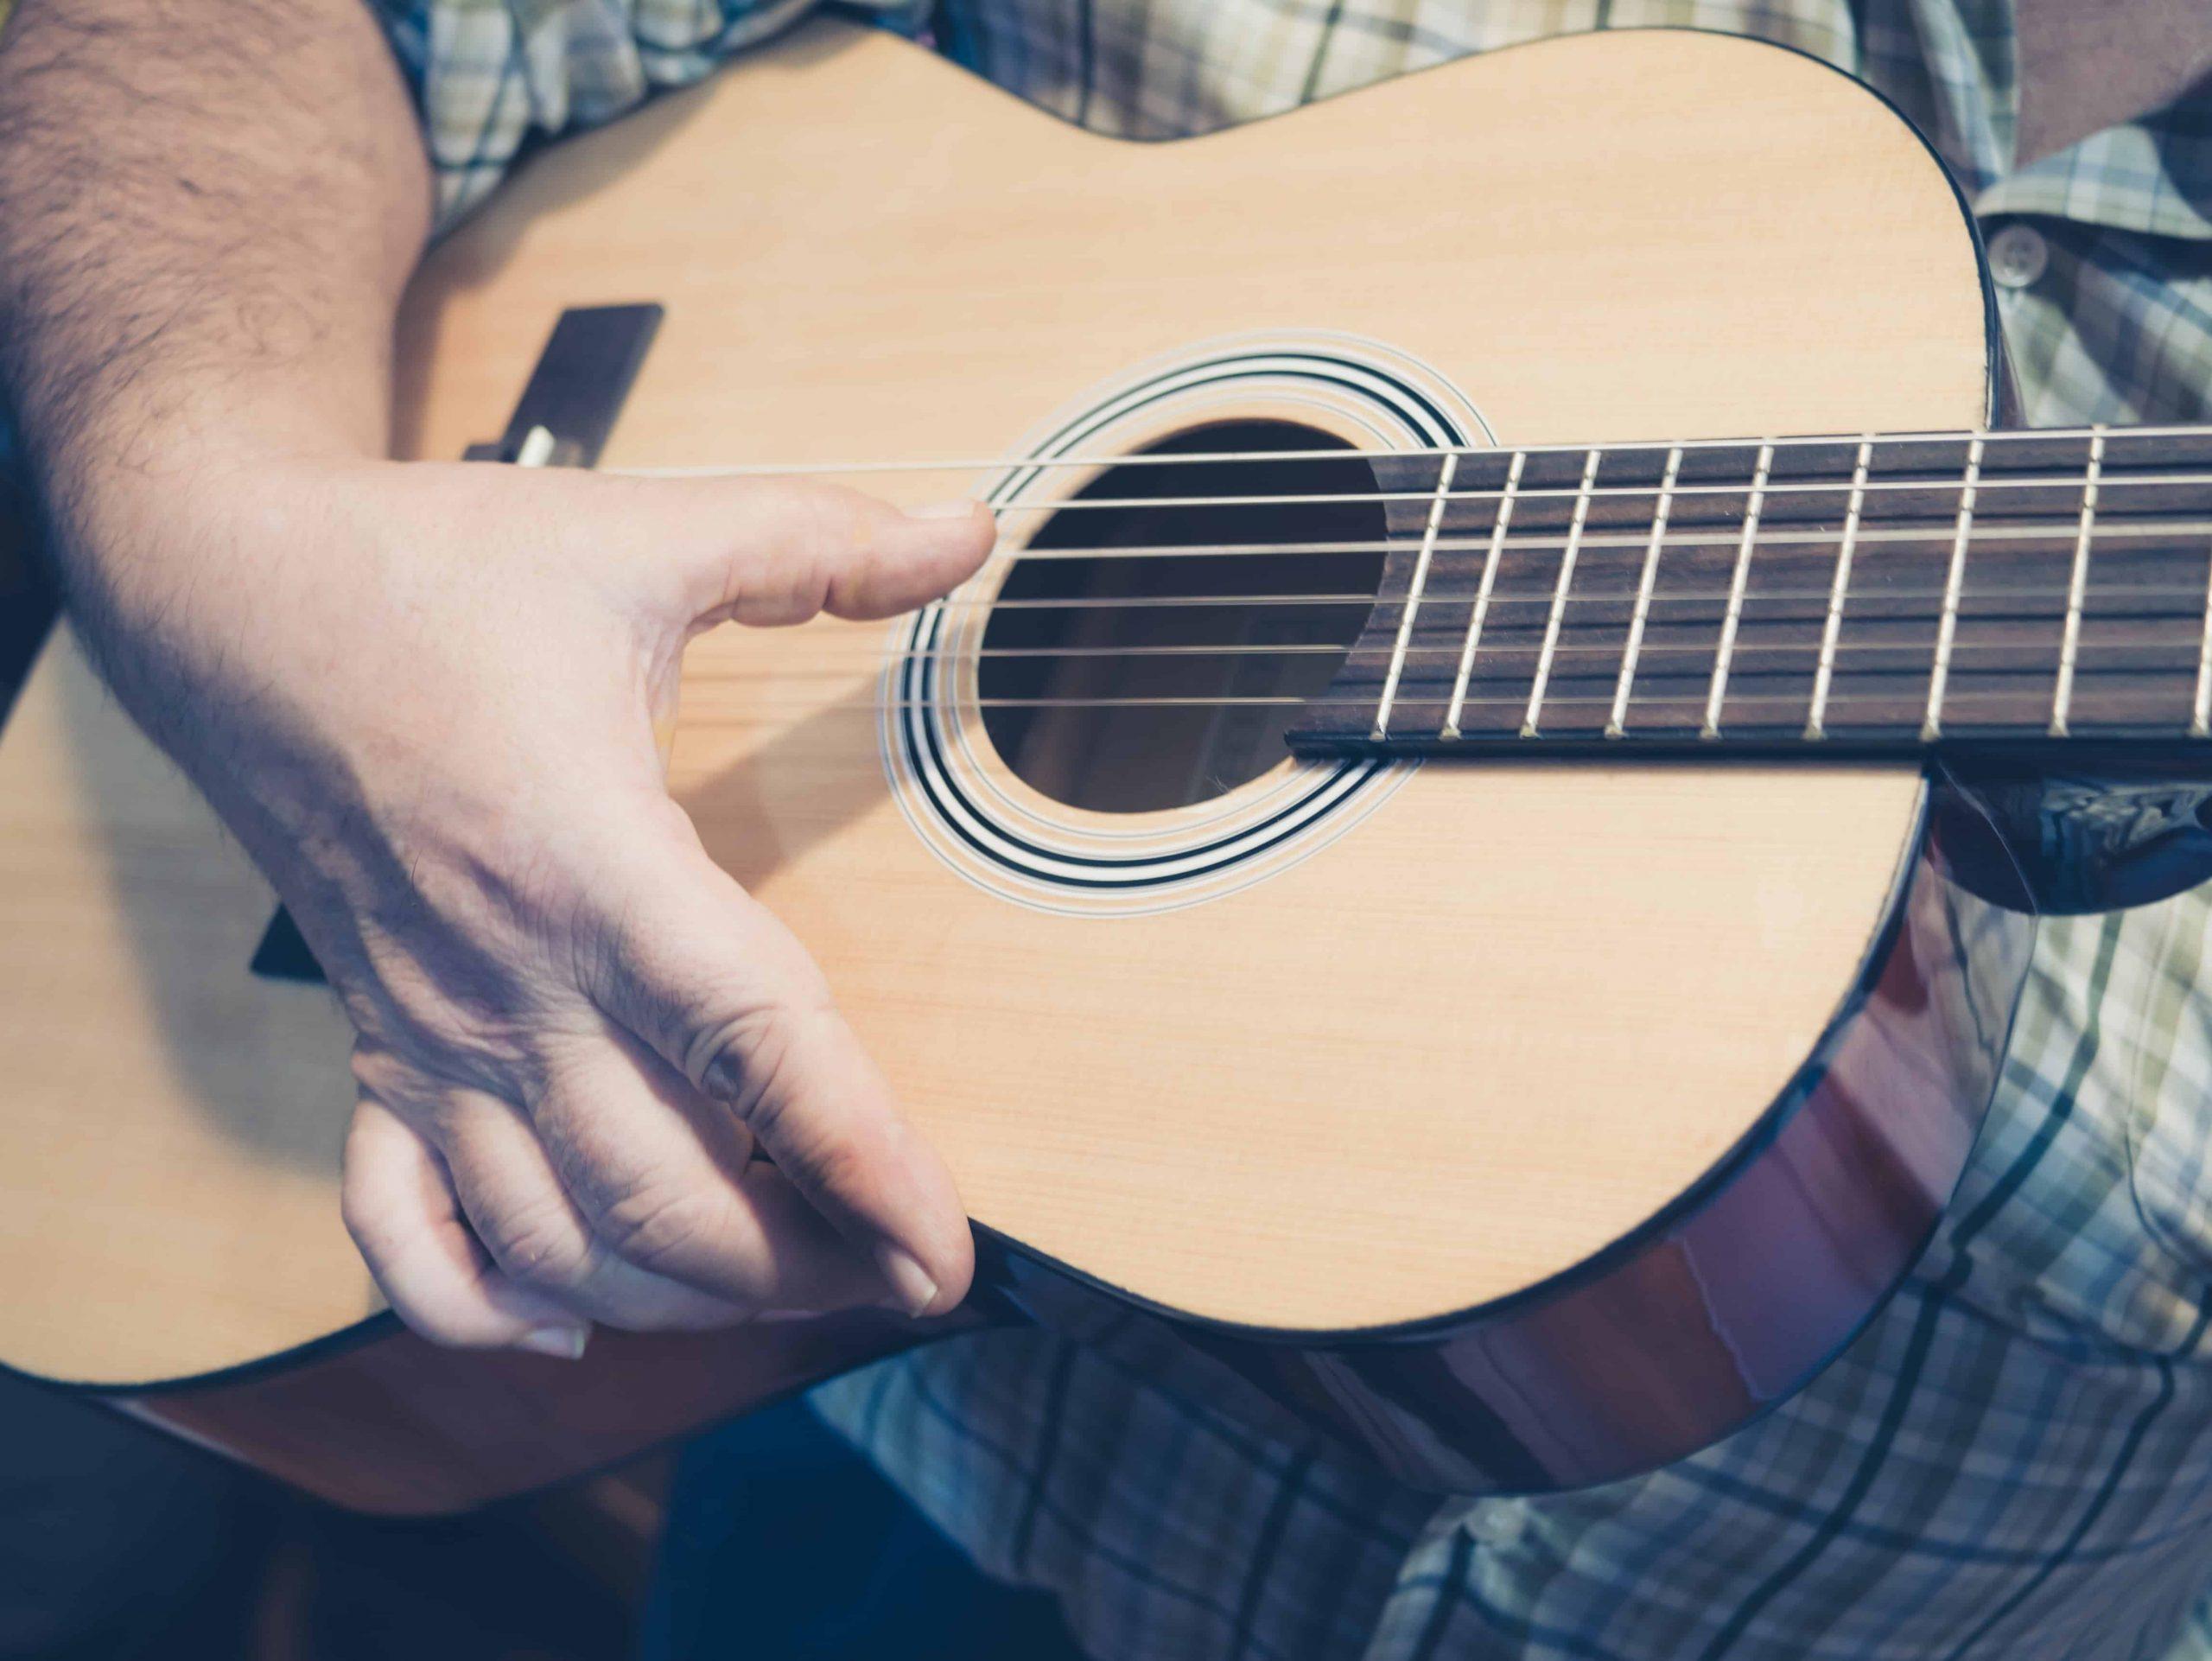 Guitarrista con guitarra flamenca